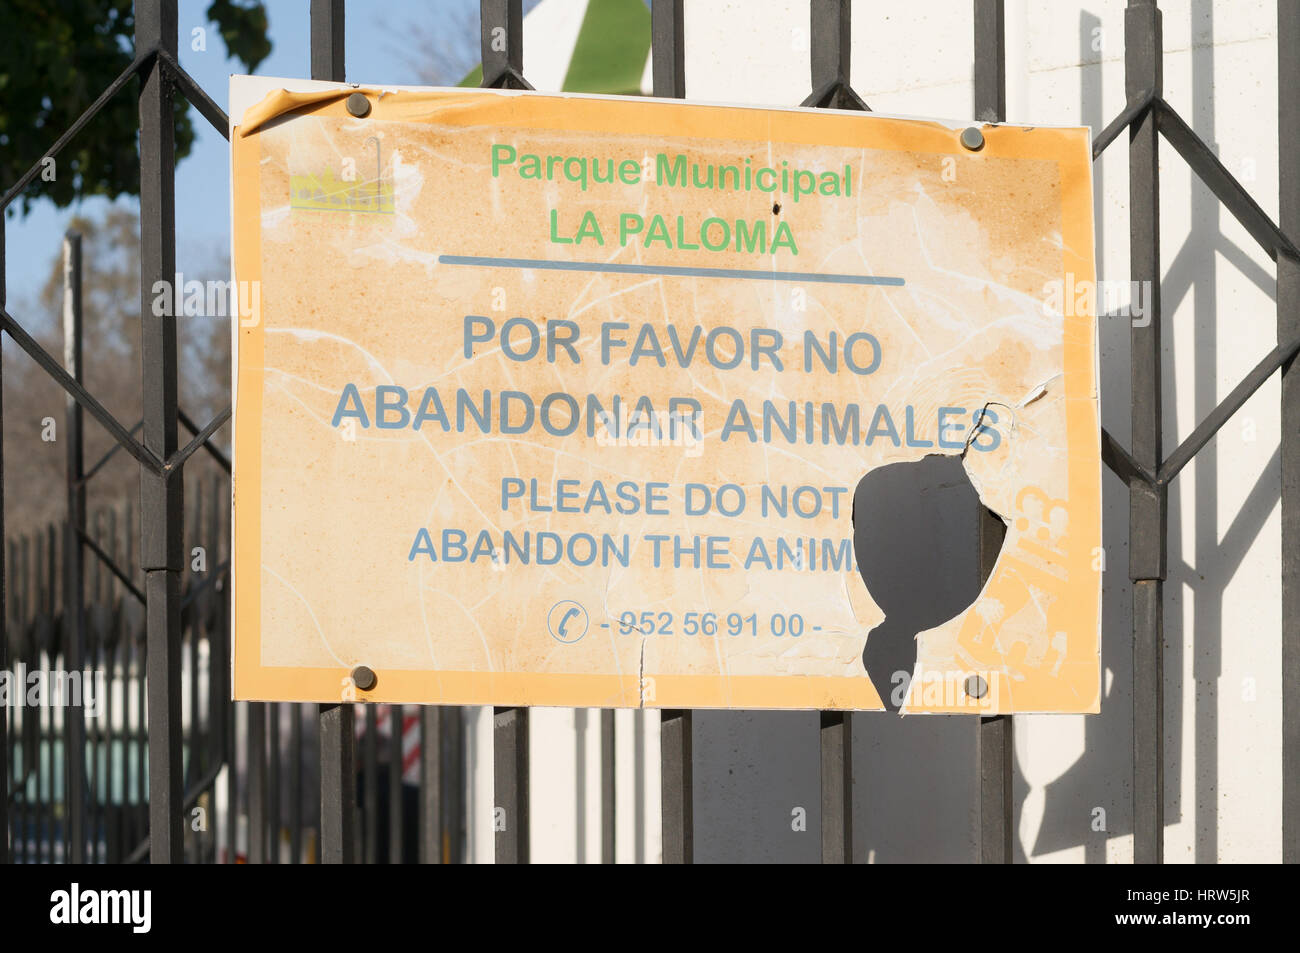 Signer, ne pas abandonner les animaux, Parque Municipal La Paloma, Benalmadena, Espagne Photo Stock